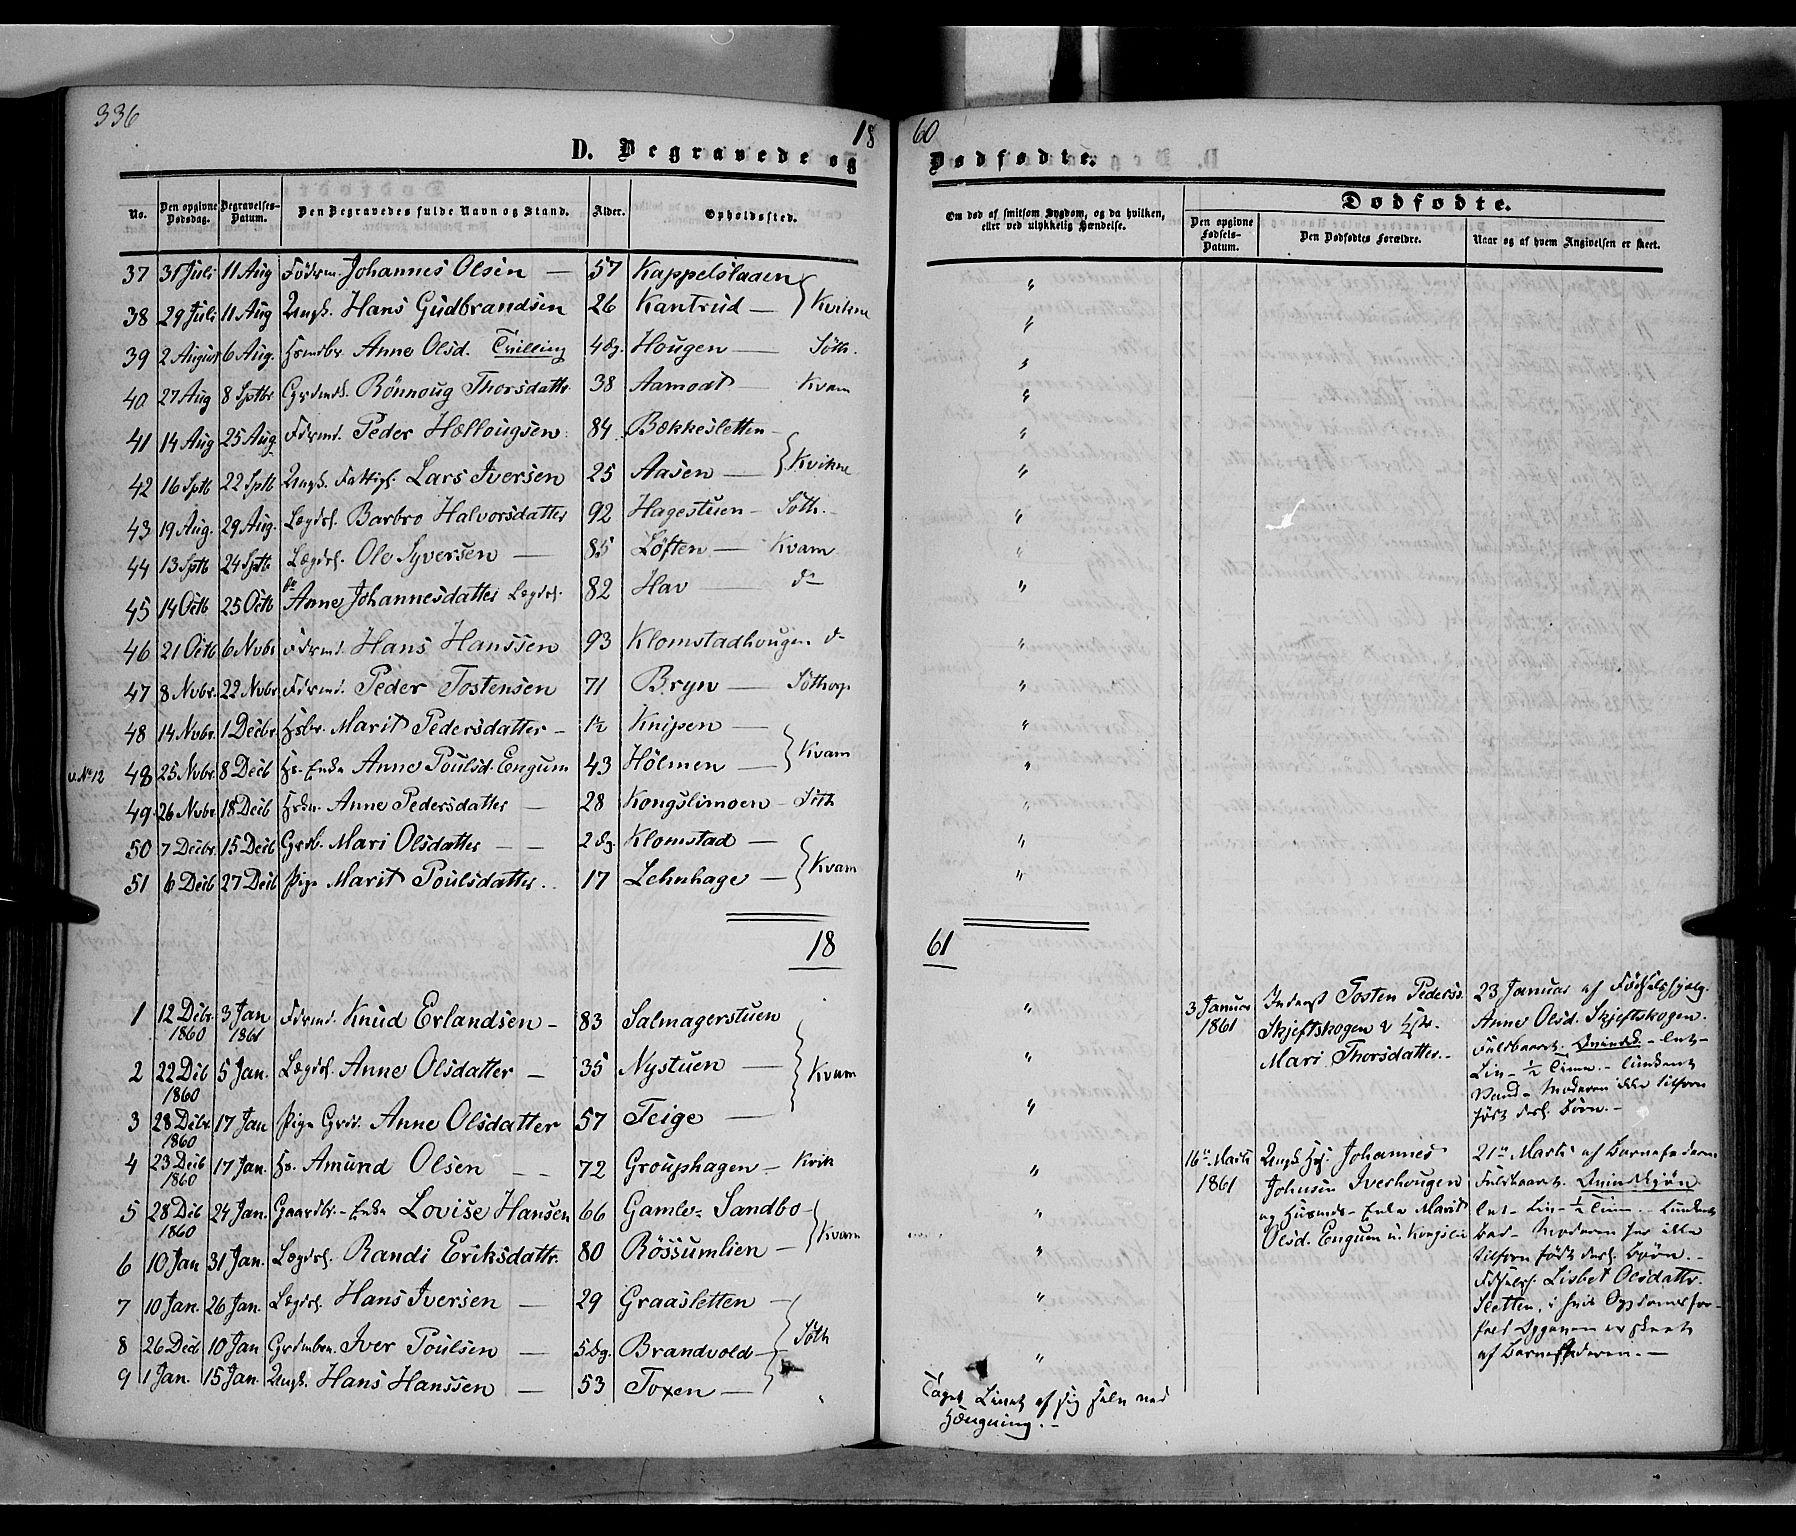 SAH, Nord-Fron prestekontor, Ministerialbok nr. 1, 1851-1864, s. 336